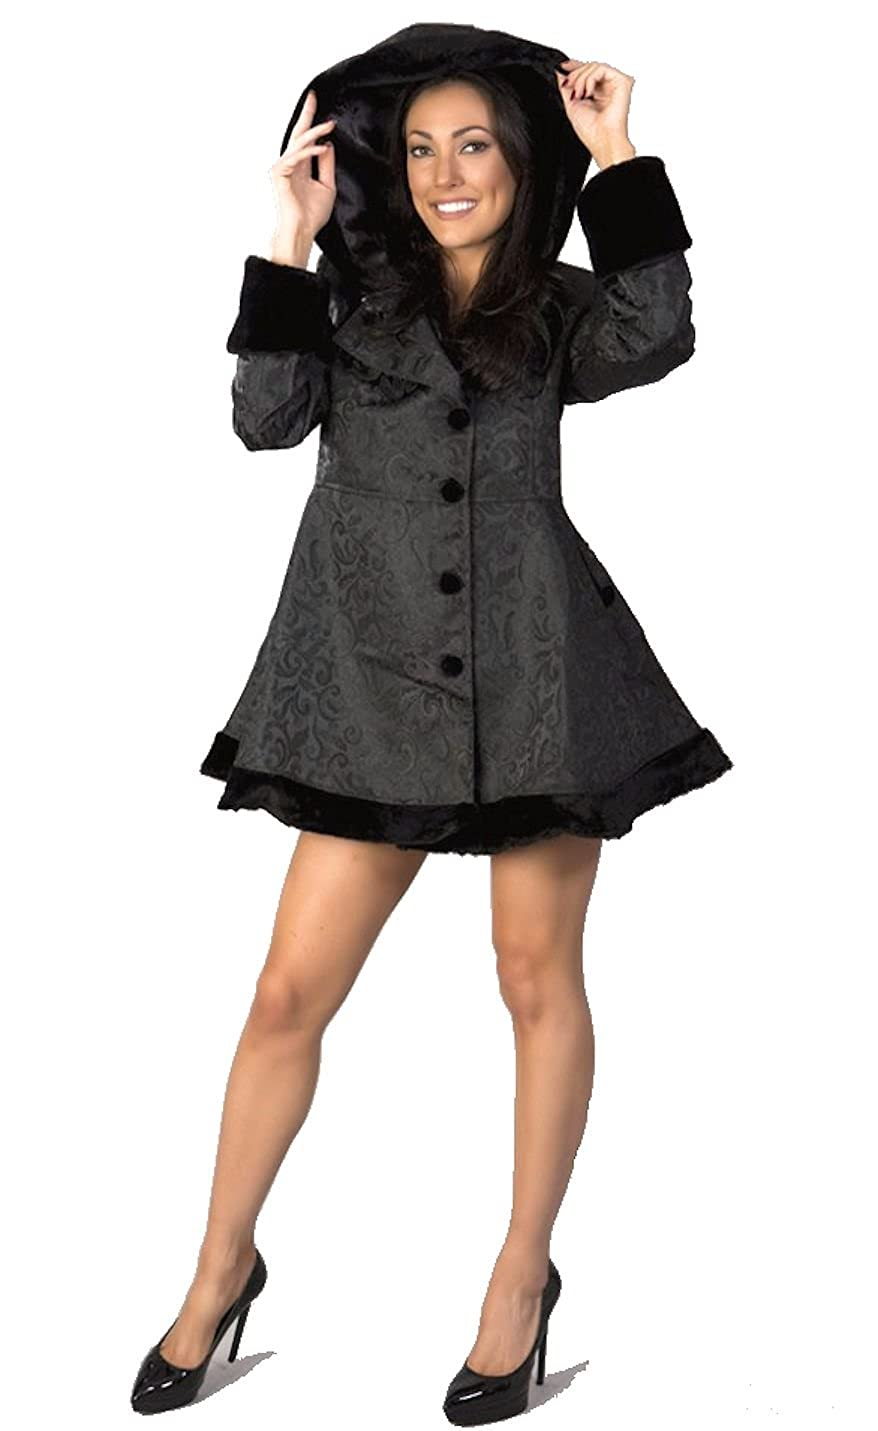 SteampunkClothing Burleska Womens Brocade Steampunk Style Karen Coat $149.99 AT vintagedancer.com